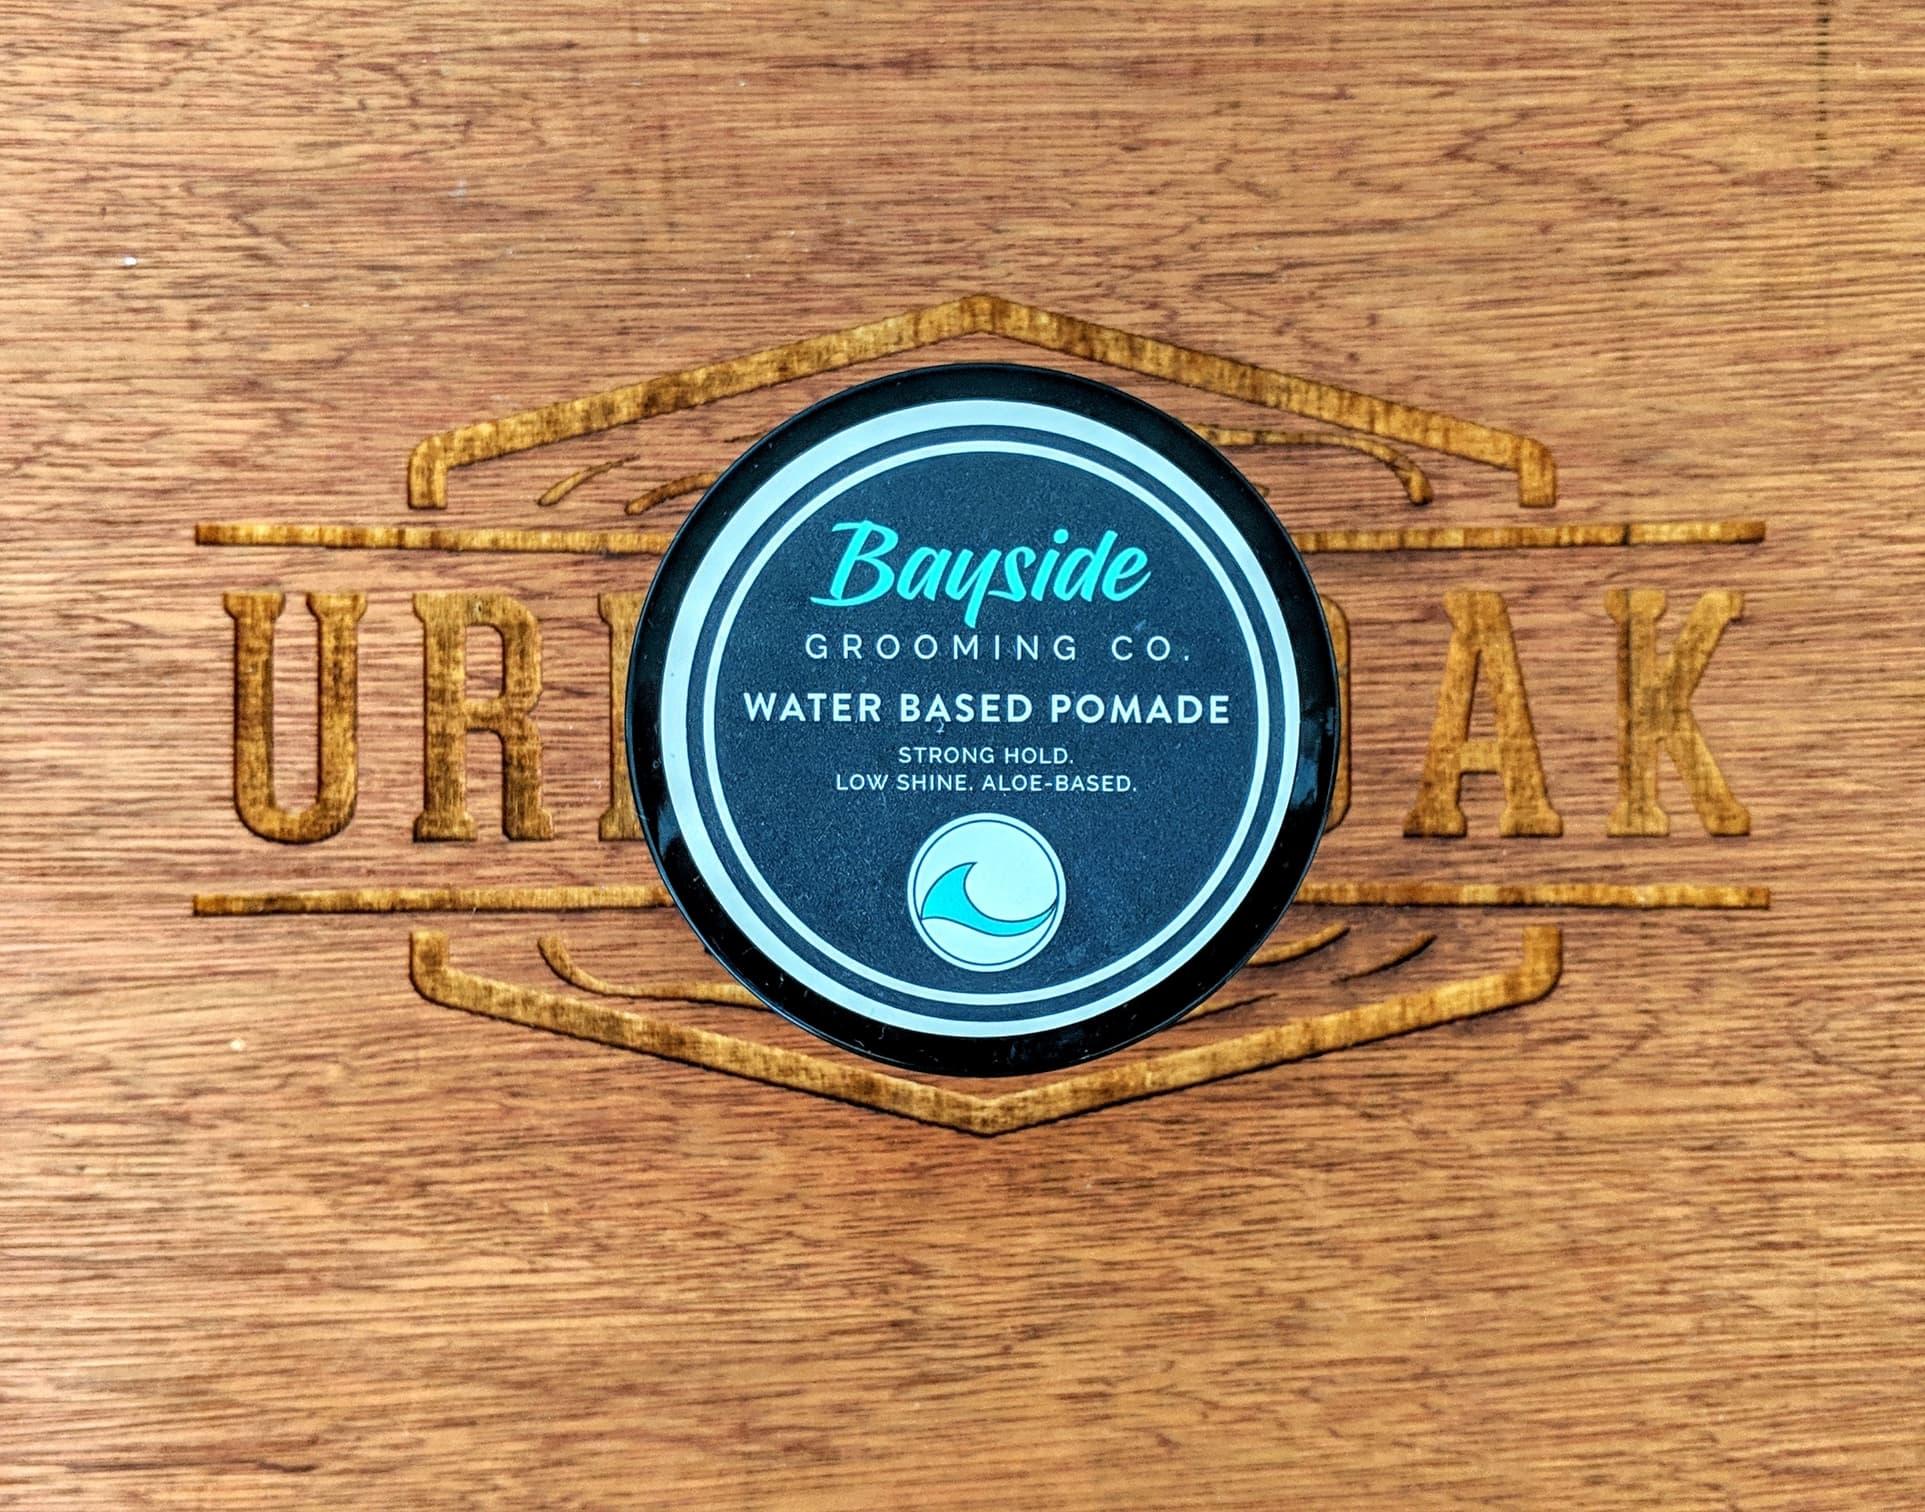 Bayside Grooming Co Water based Pomade